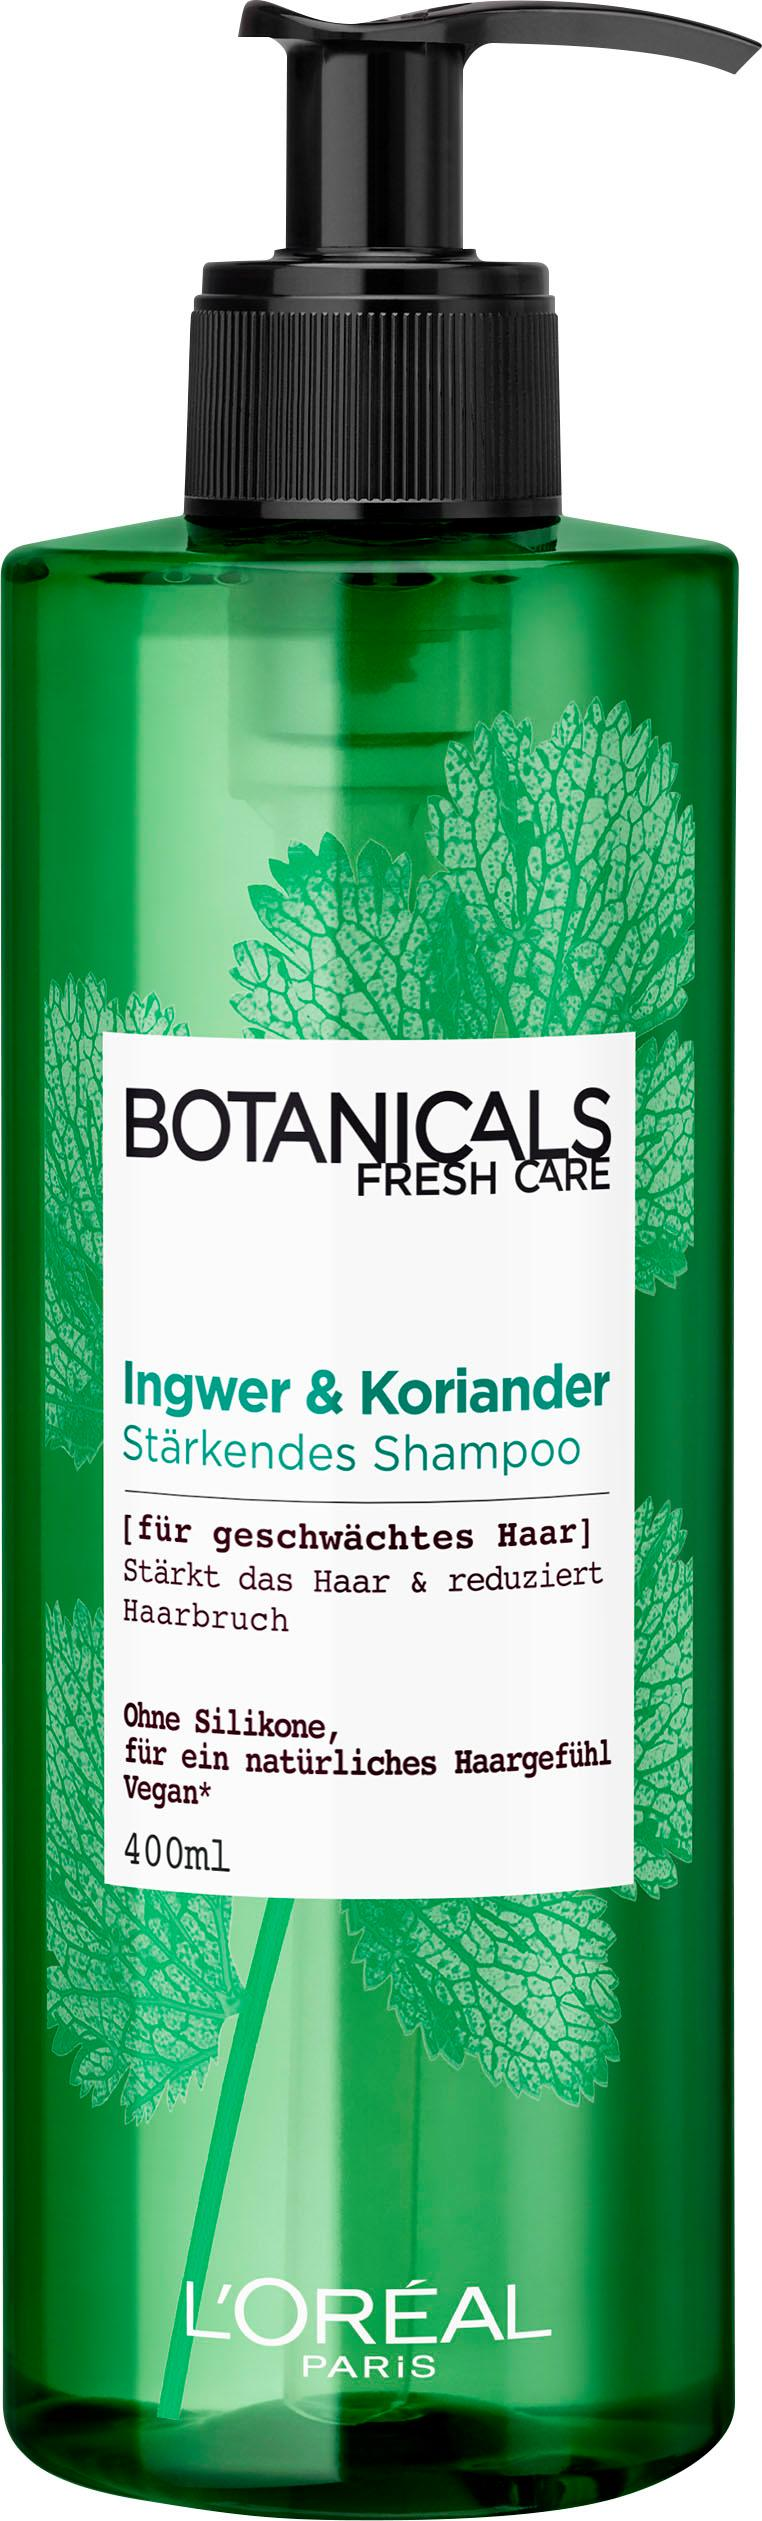 BOTANICALS, »Kraftkur«, Haarkur   Bekleidung > Bademode > Bademäntel   Mehrfarbig   BOTANICALS